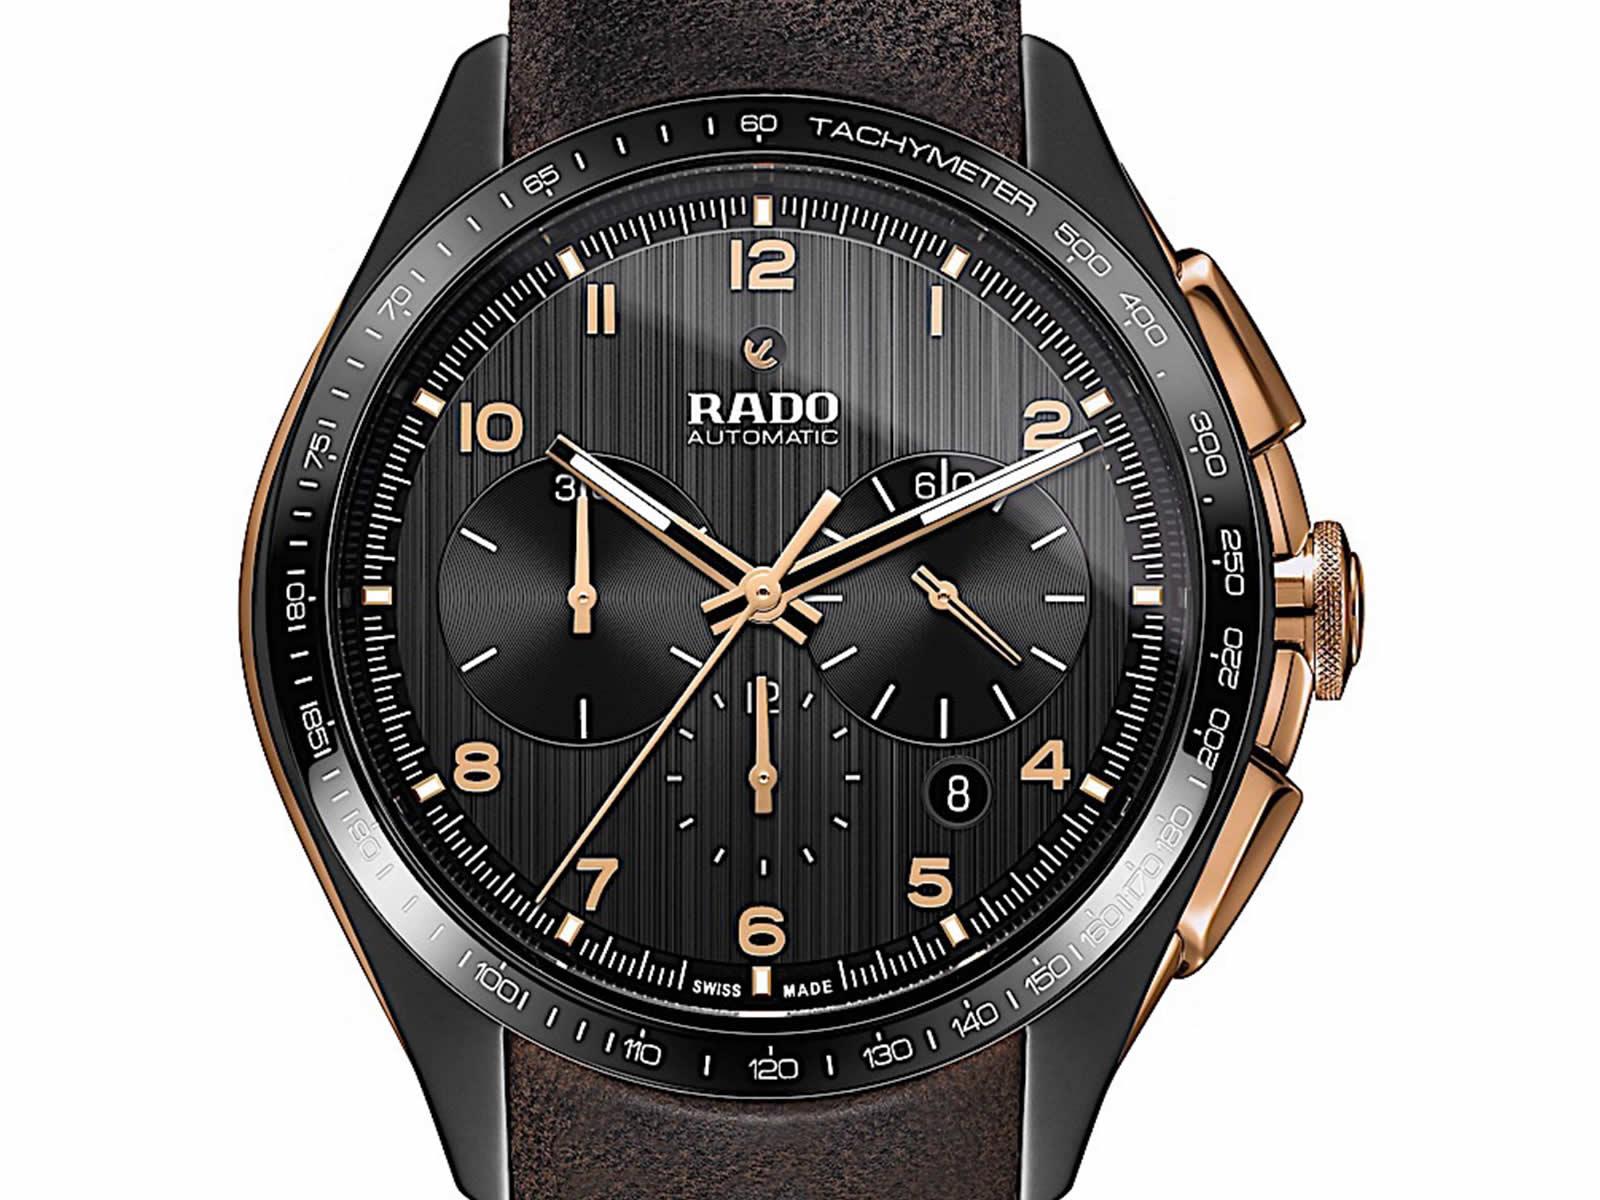 650-0168-3-115-rado-hyperChrome-automatic-chronograph-3-.jpg